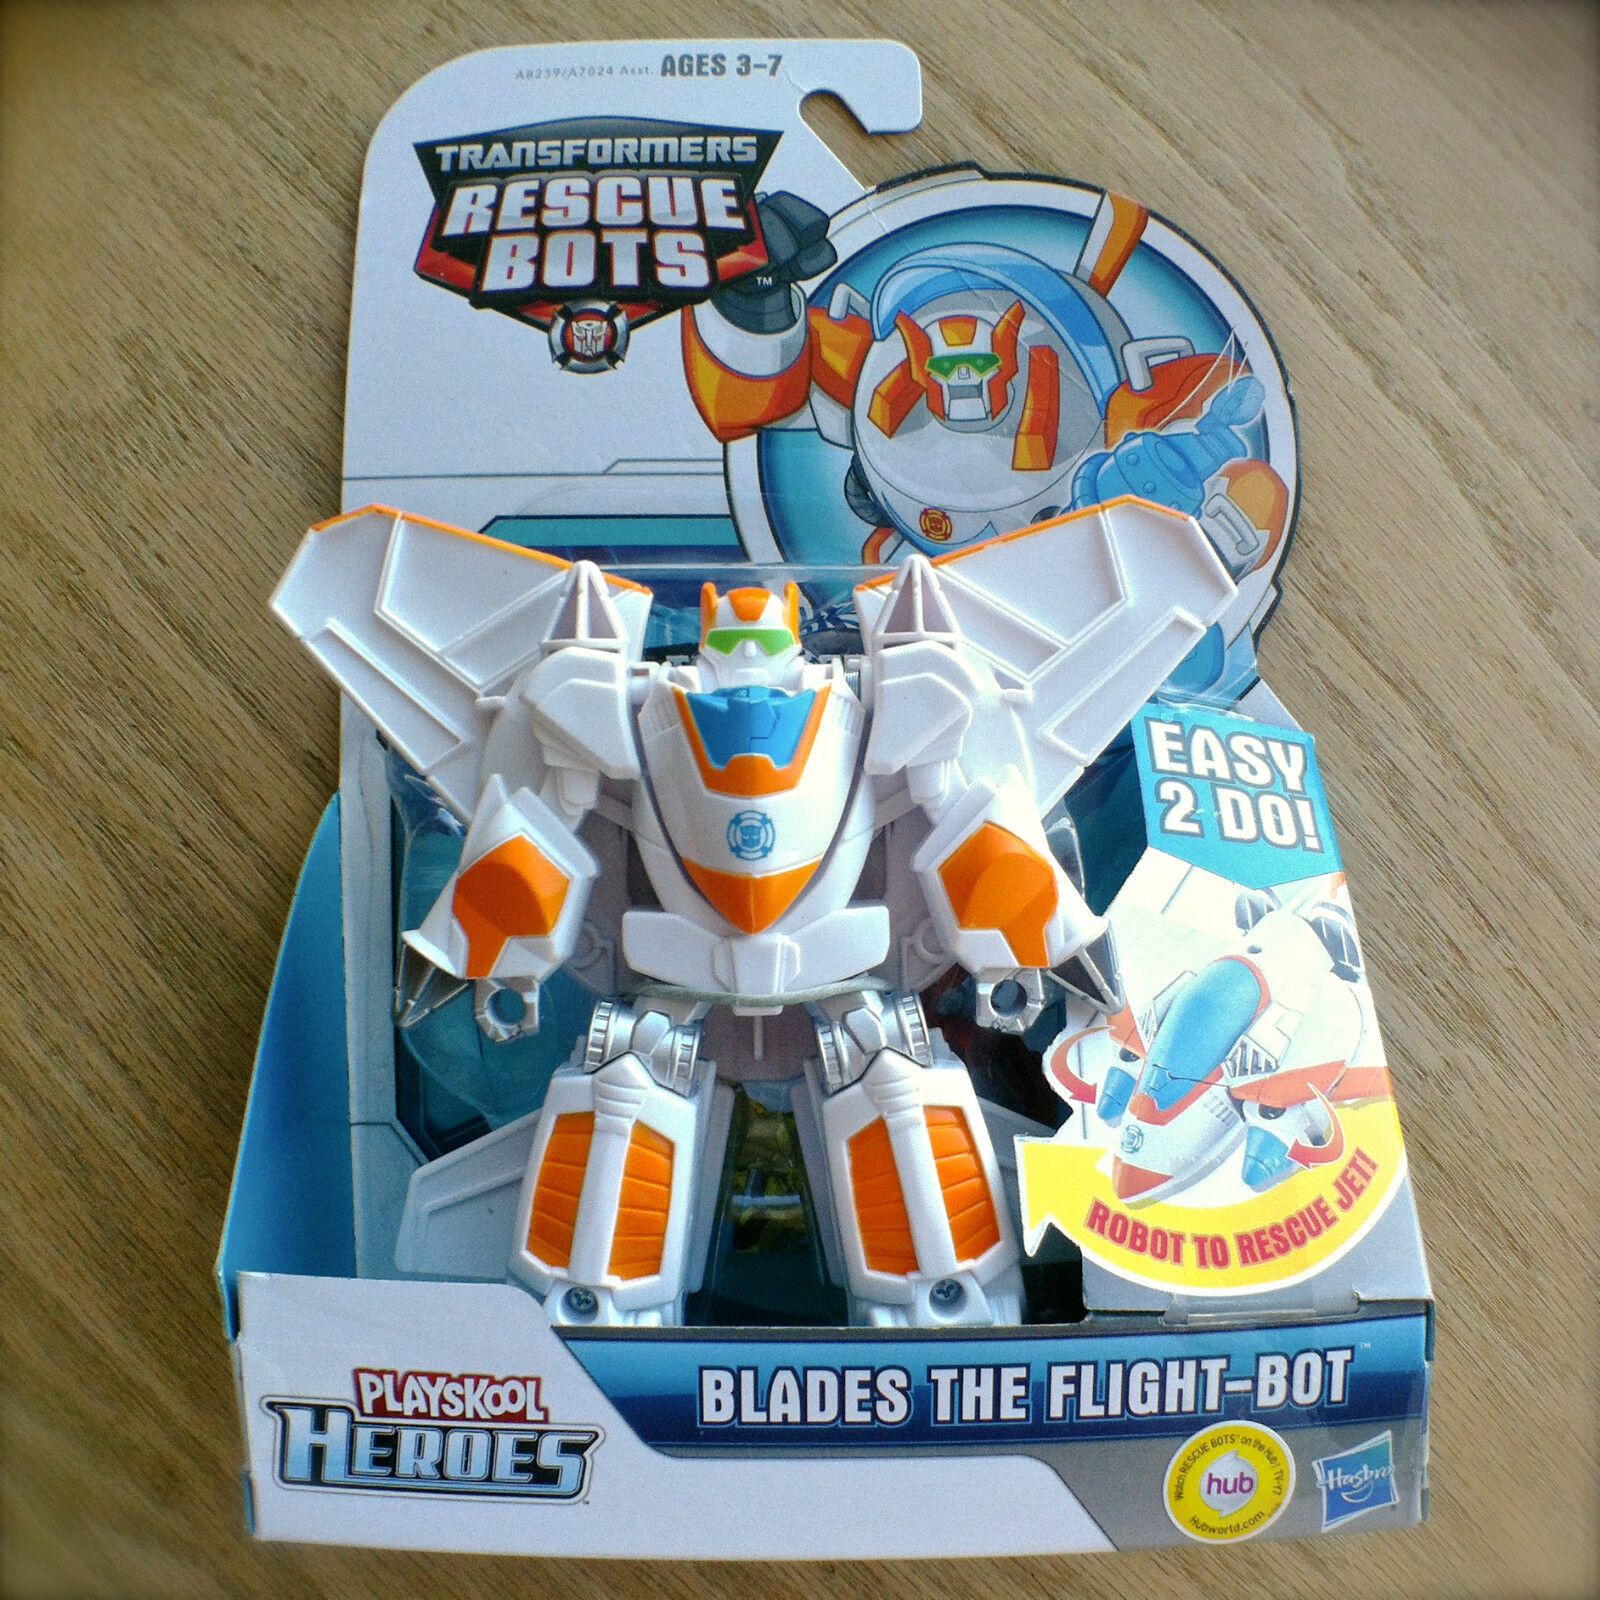 Transformers RESCUE BOTS Blades Flight-Bot Rescan Jet PLAYSKOOL HEROES Hasbro